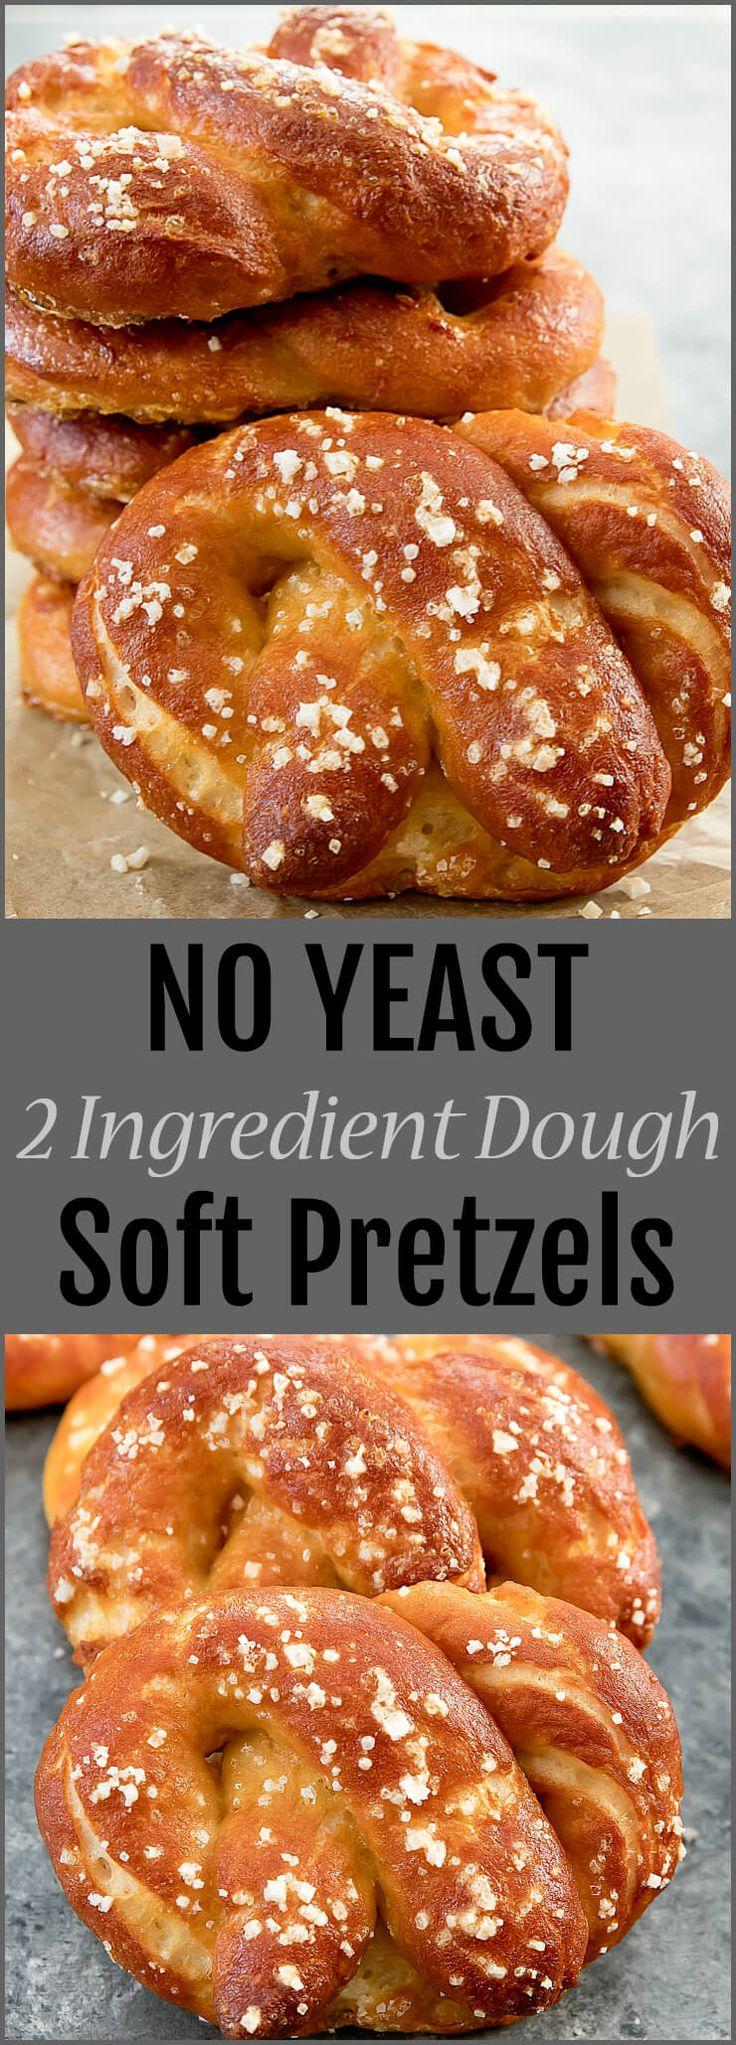 No yeast soft pretzels recipe soft pretzels no yeast